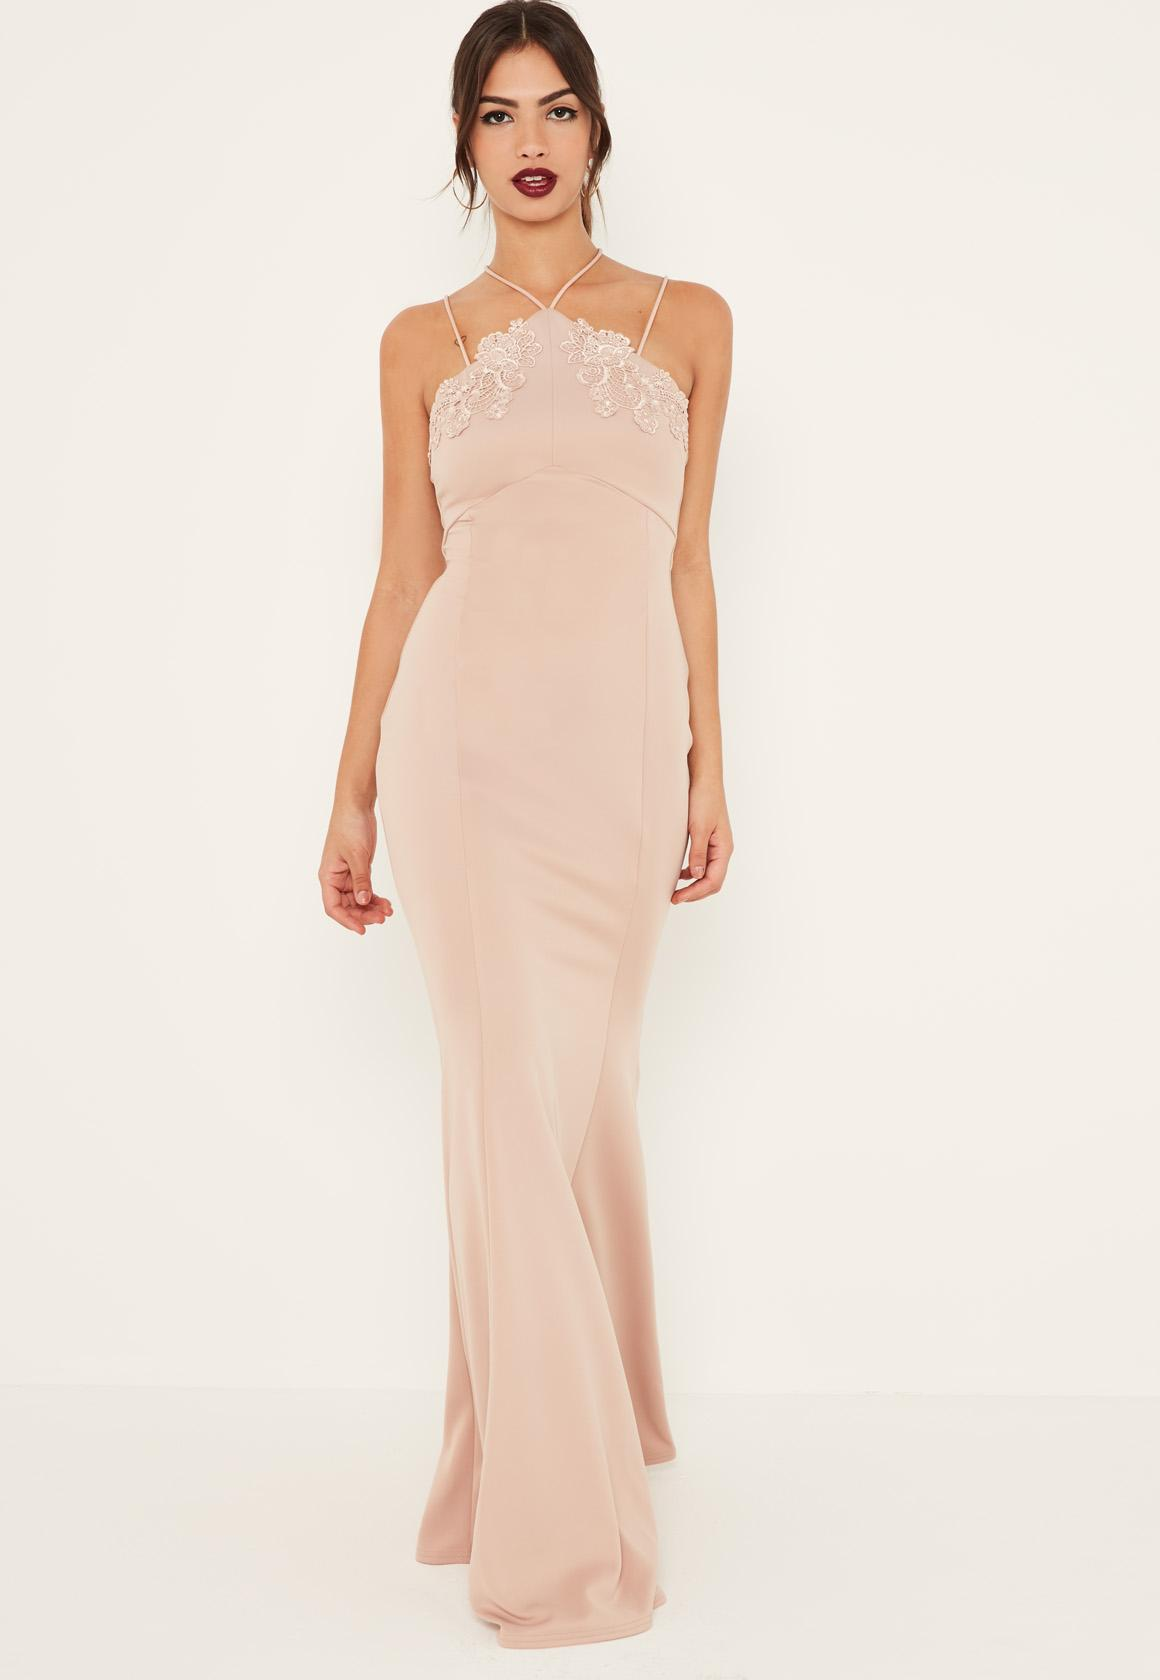 cba20629d02 Lipsy Petite Lace Bardot Bridal Maxi Dress